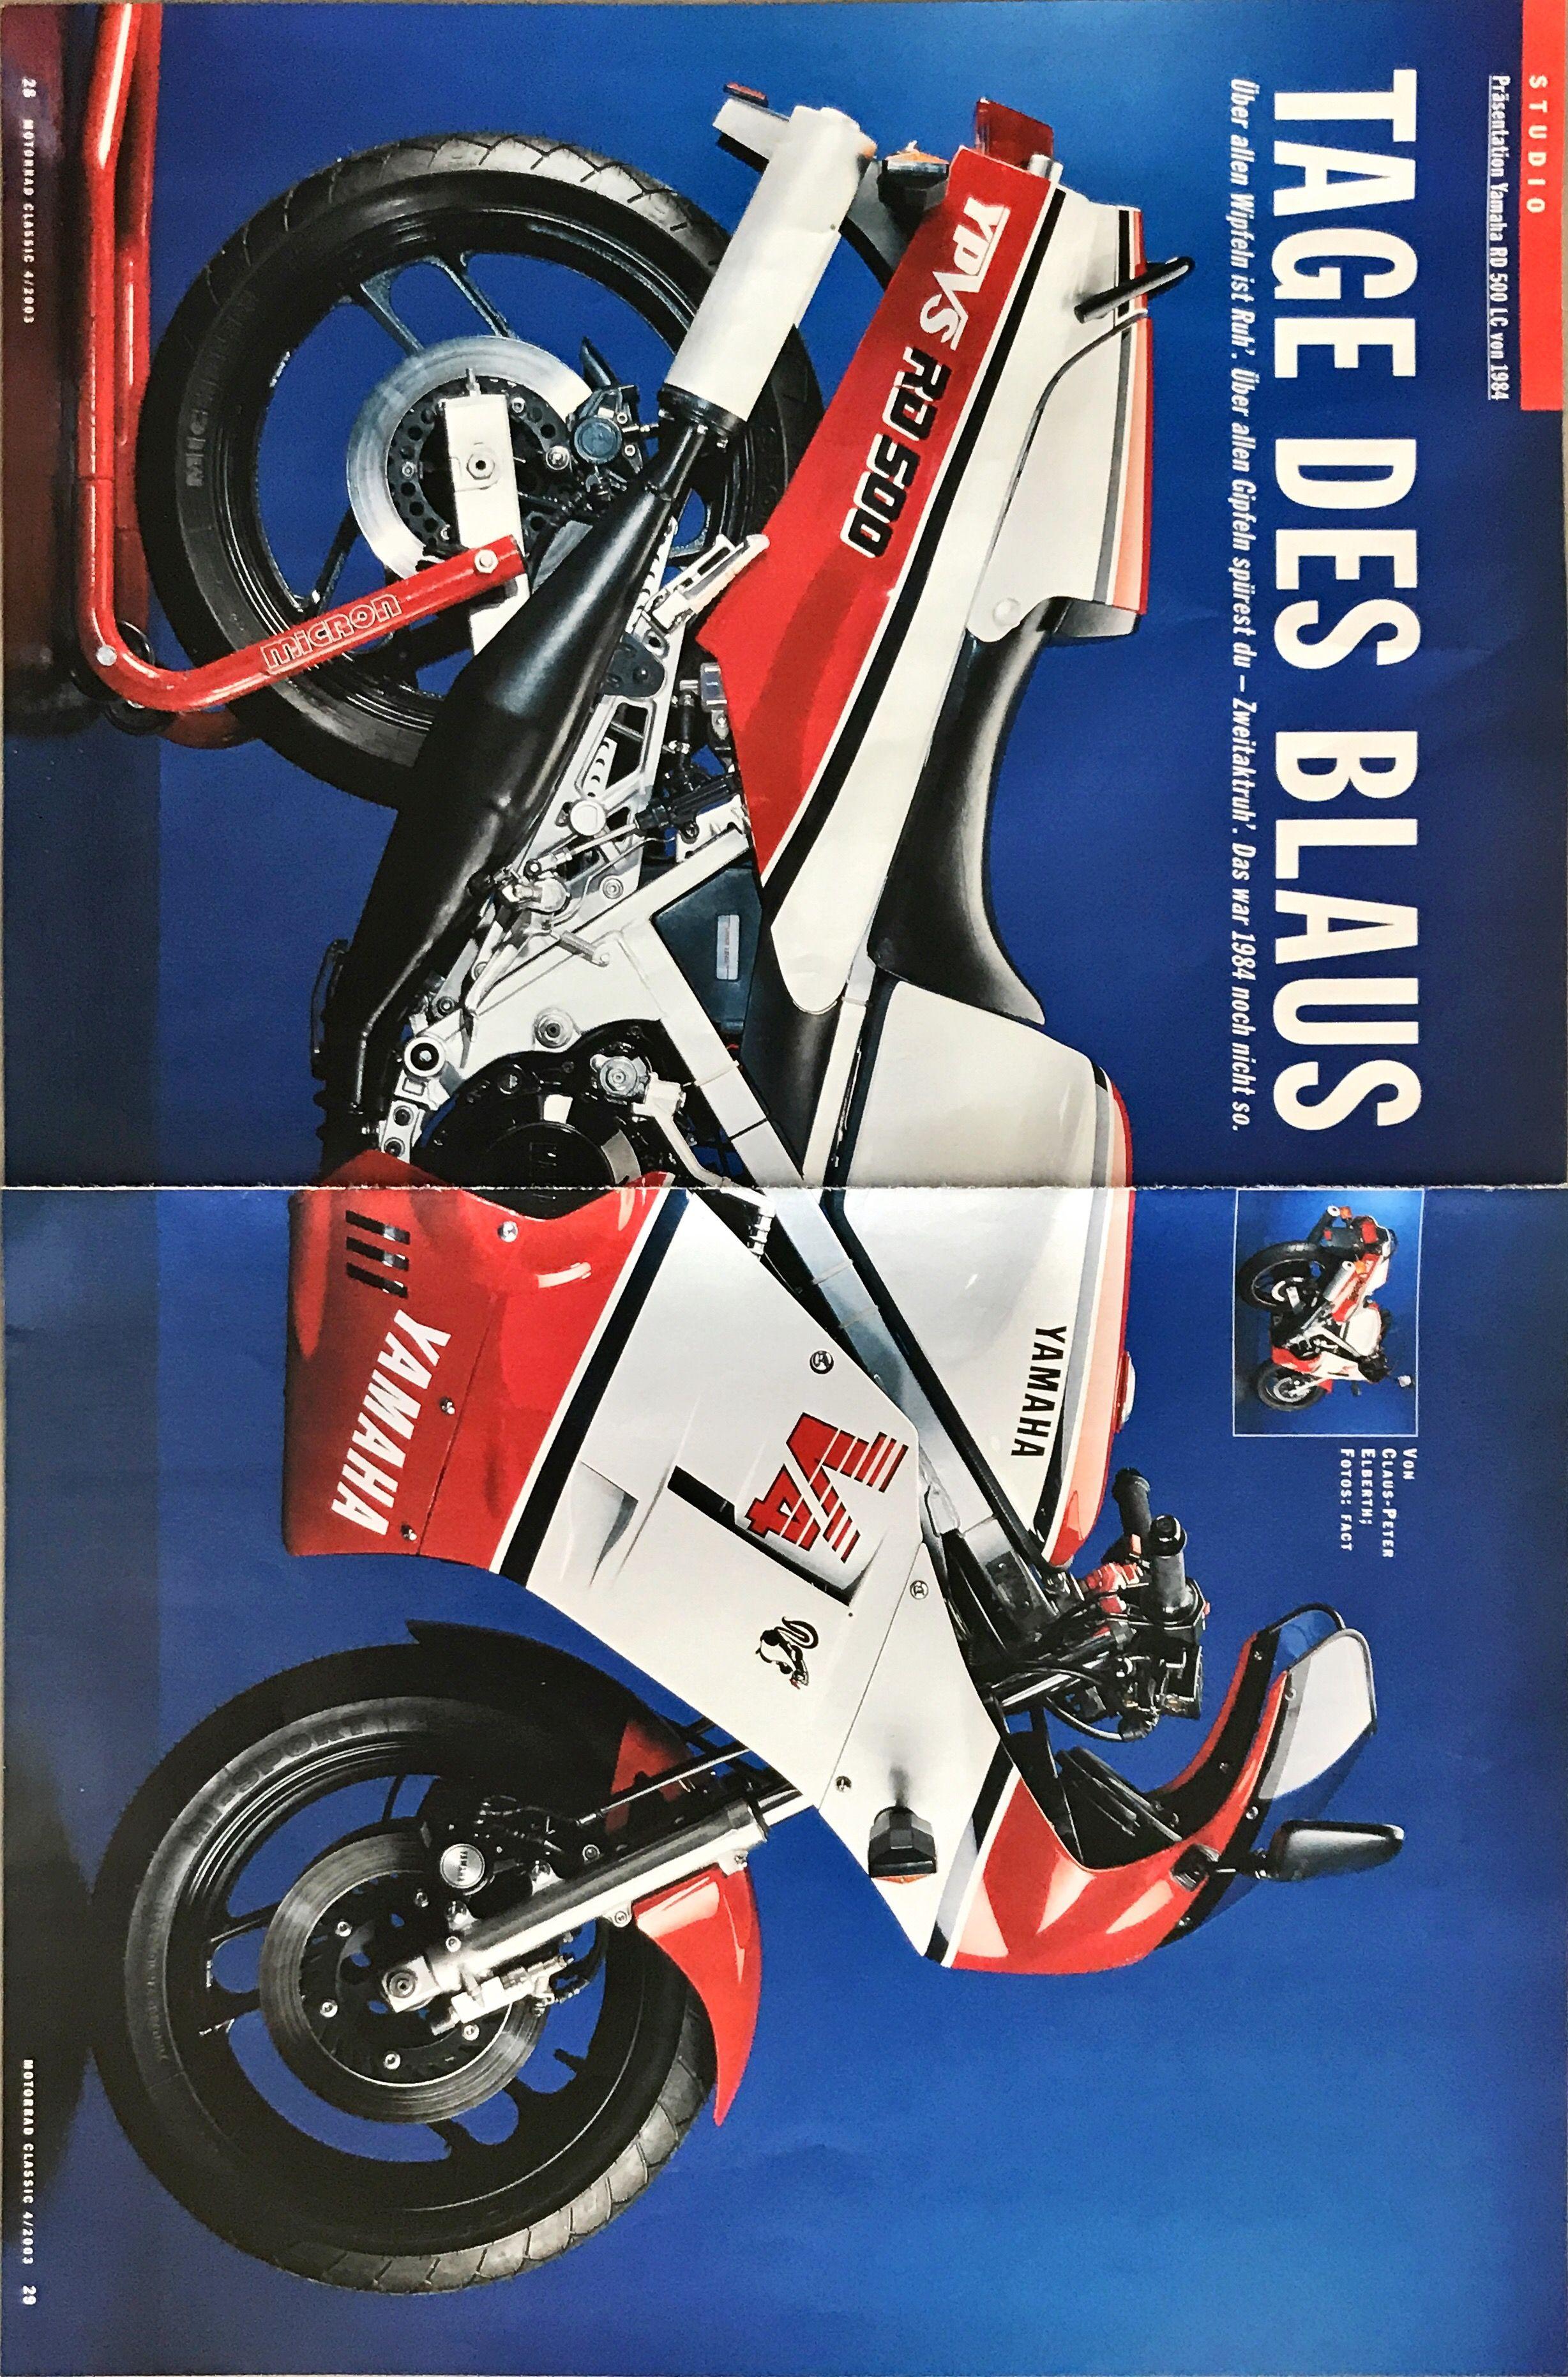 Moto Bike Sportbikes Custom Bikes Yamaha Bicycles Carotorcycles